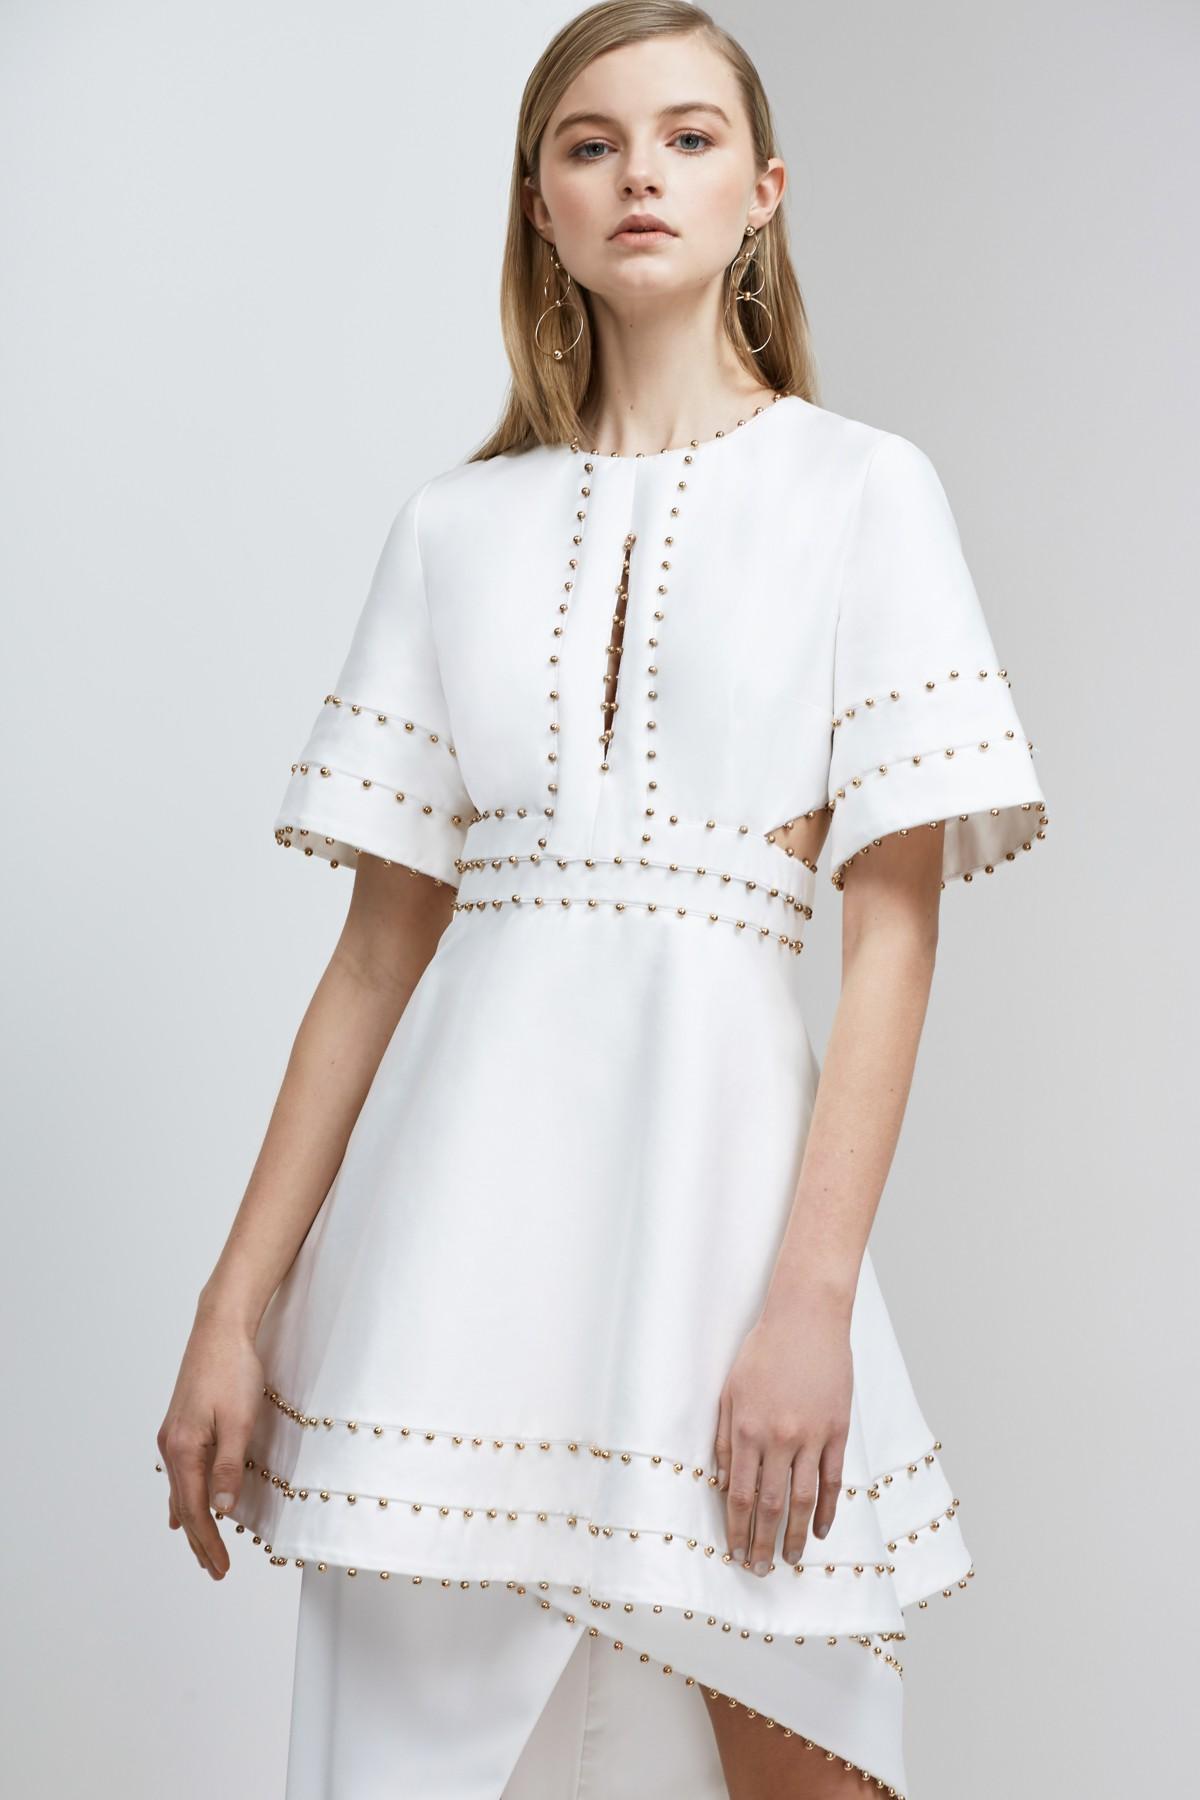 Shop  Keepsake All In Love Mini Dress  +  All In Love Skirt .